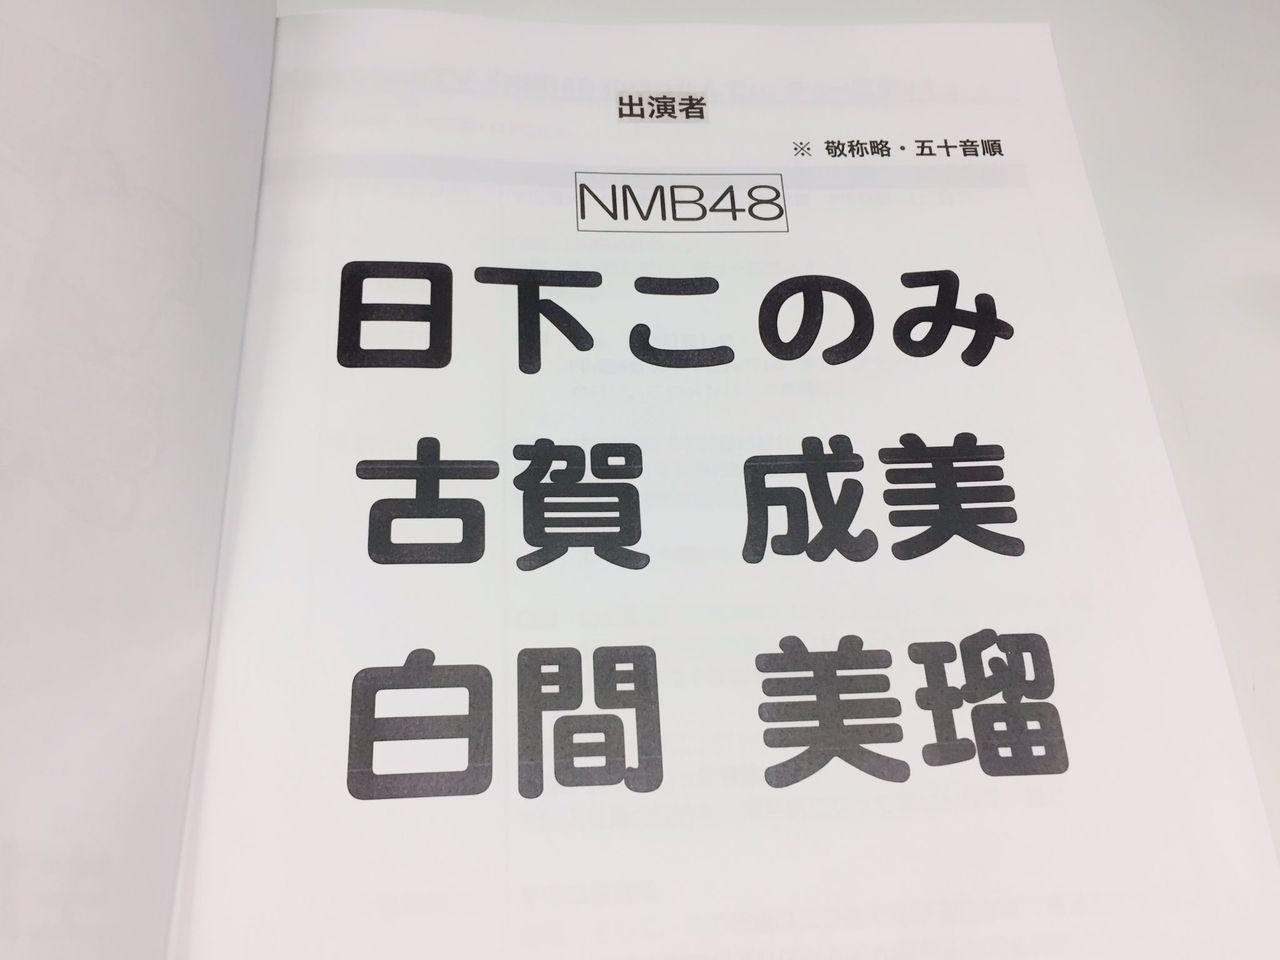 【KawaiianTV】本日の『NMB48のやったんでぃ』になるみるえのきキタ━━━━(゚∀゚)━━━━!!【白間美瑠・古賀成美・日下このみ】